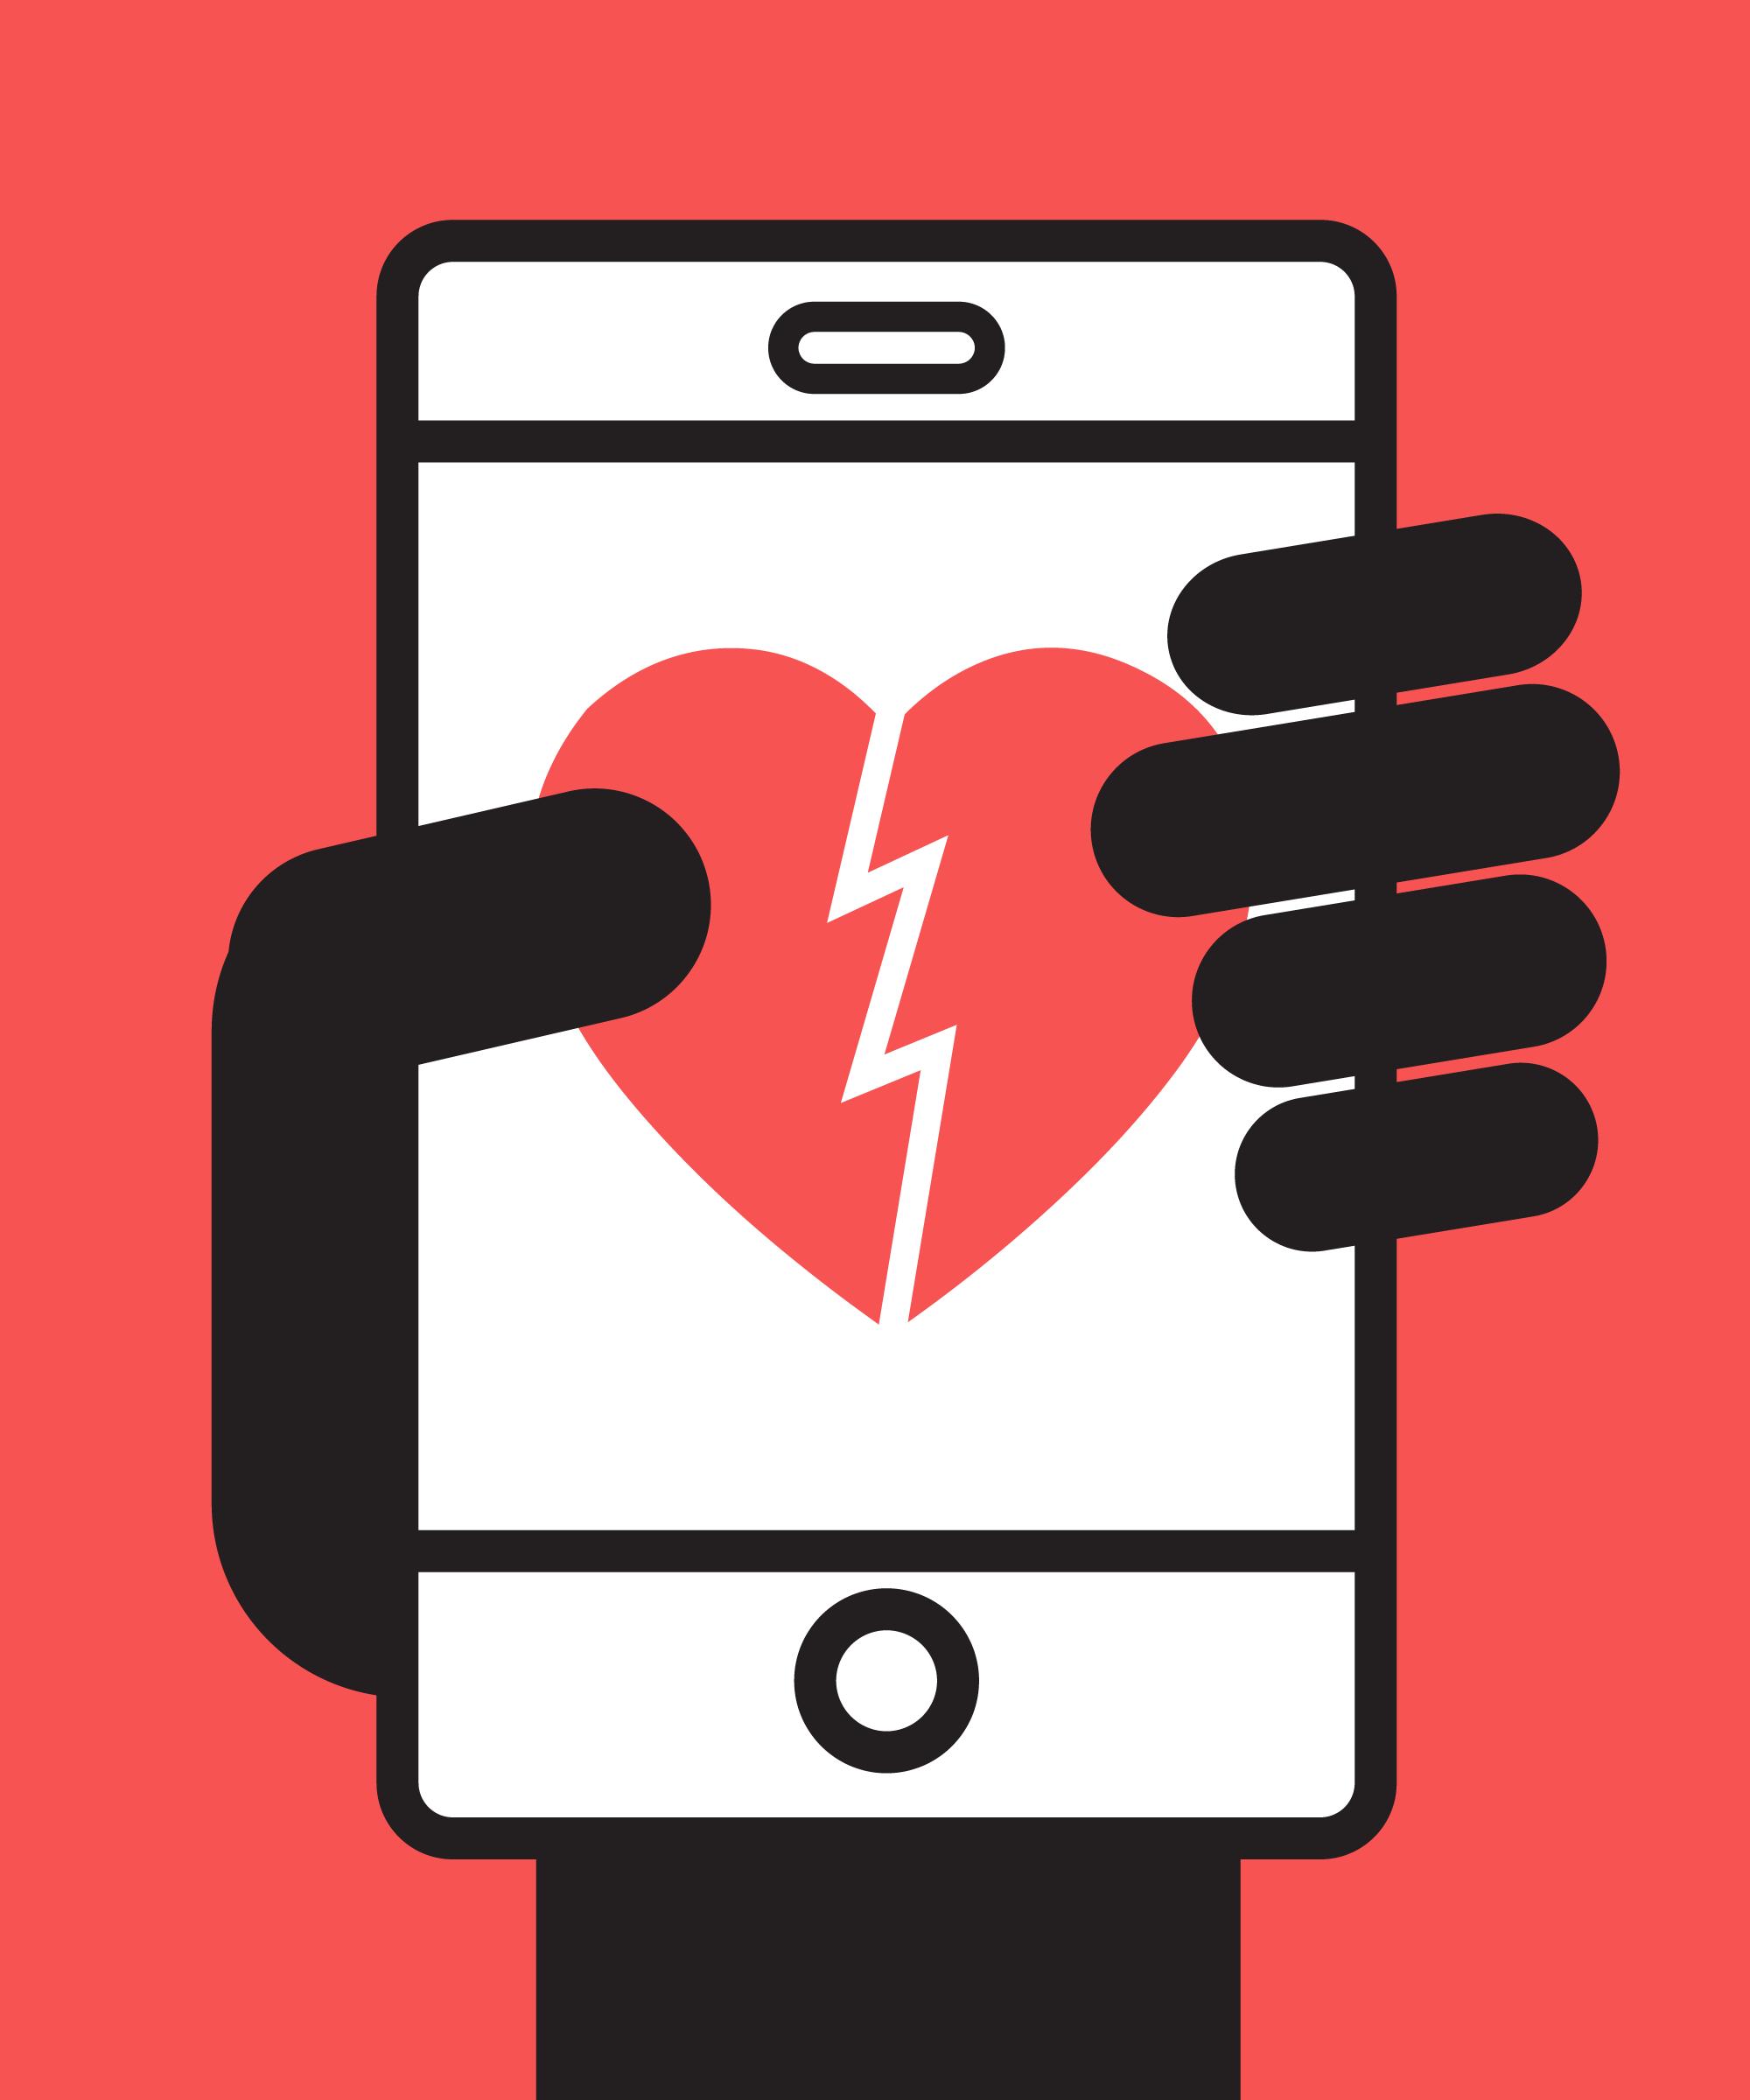 K.t.2 pravda na zadatku online dating